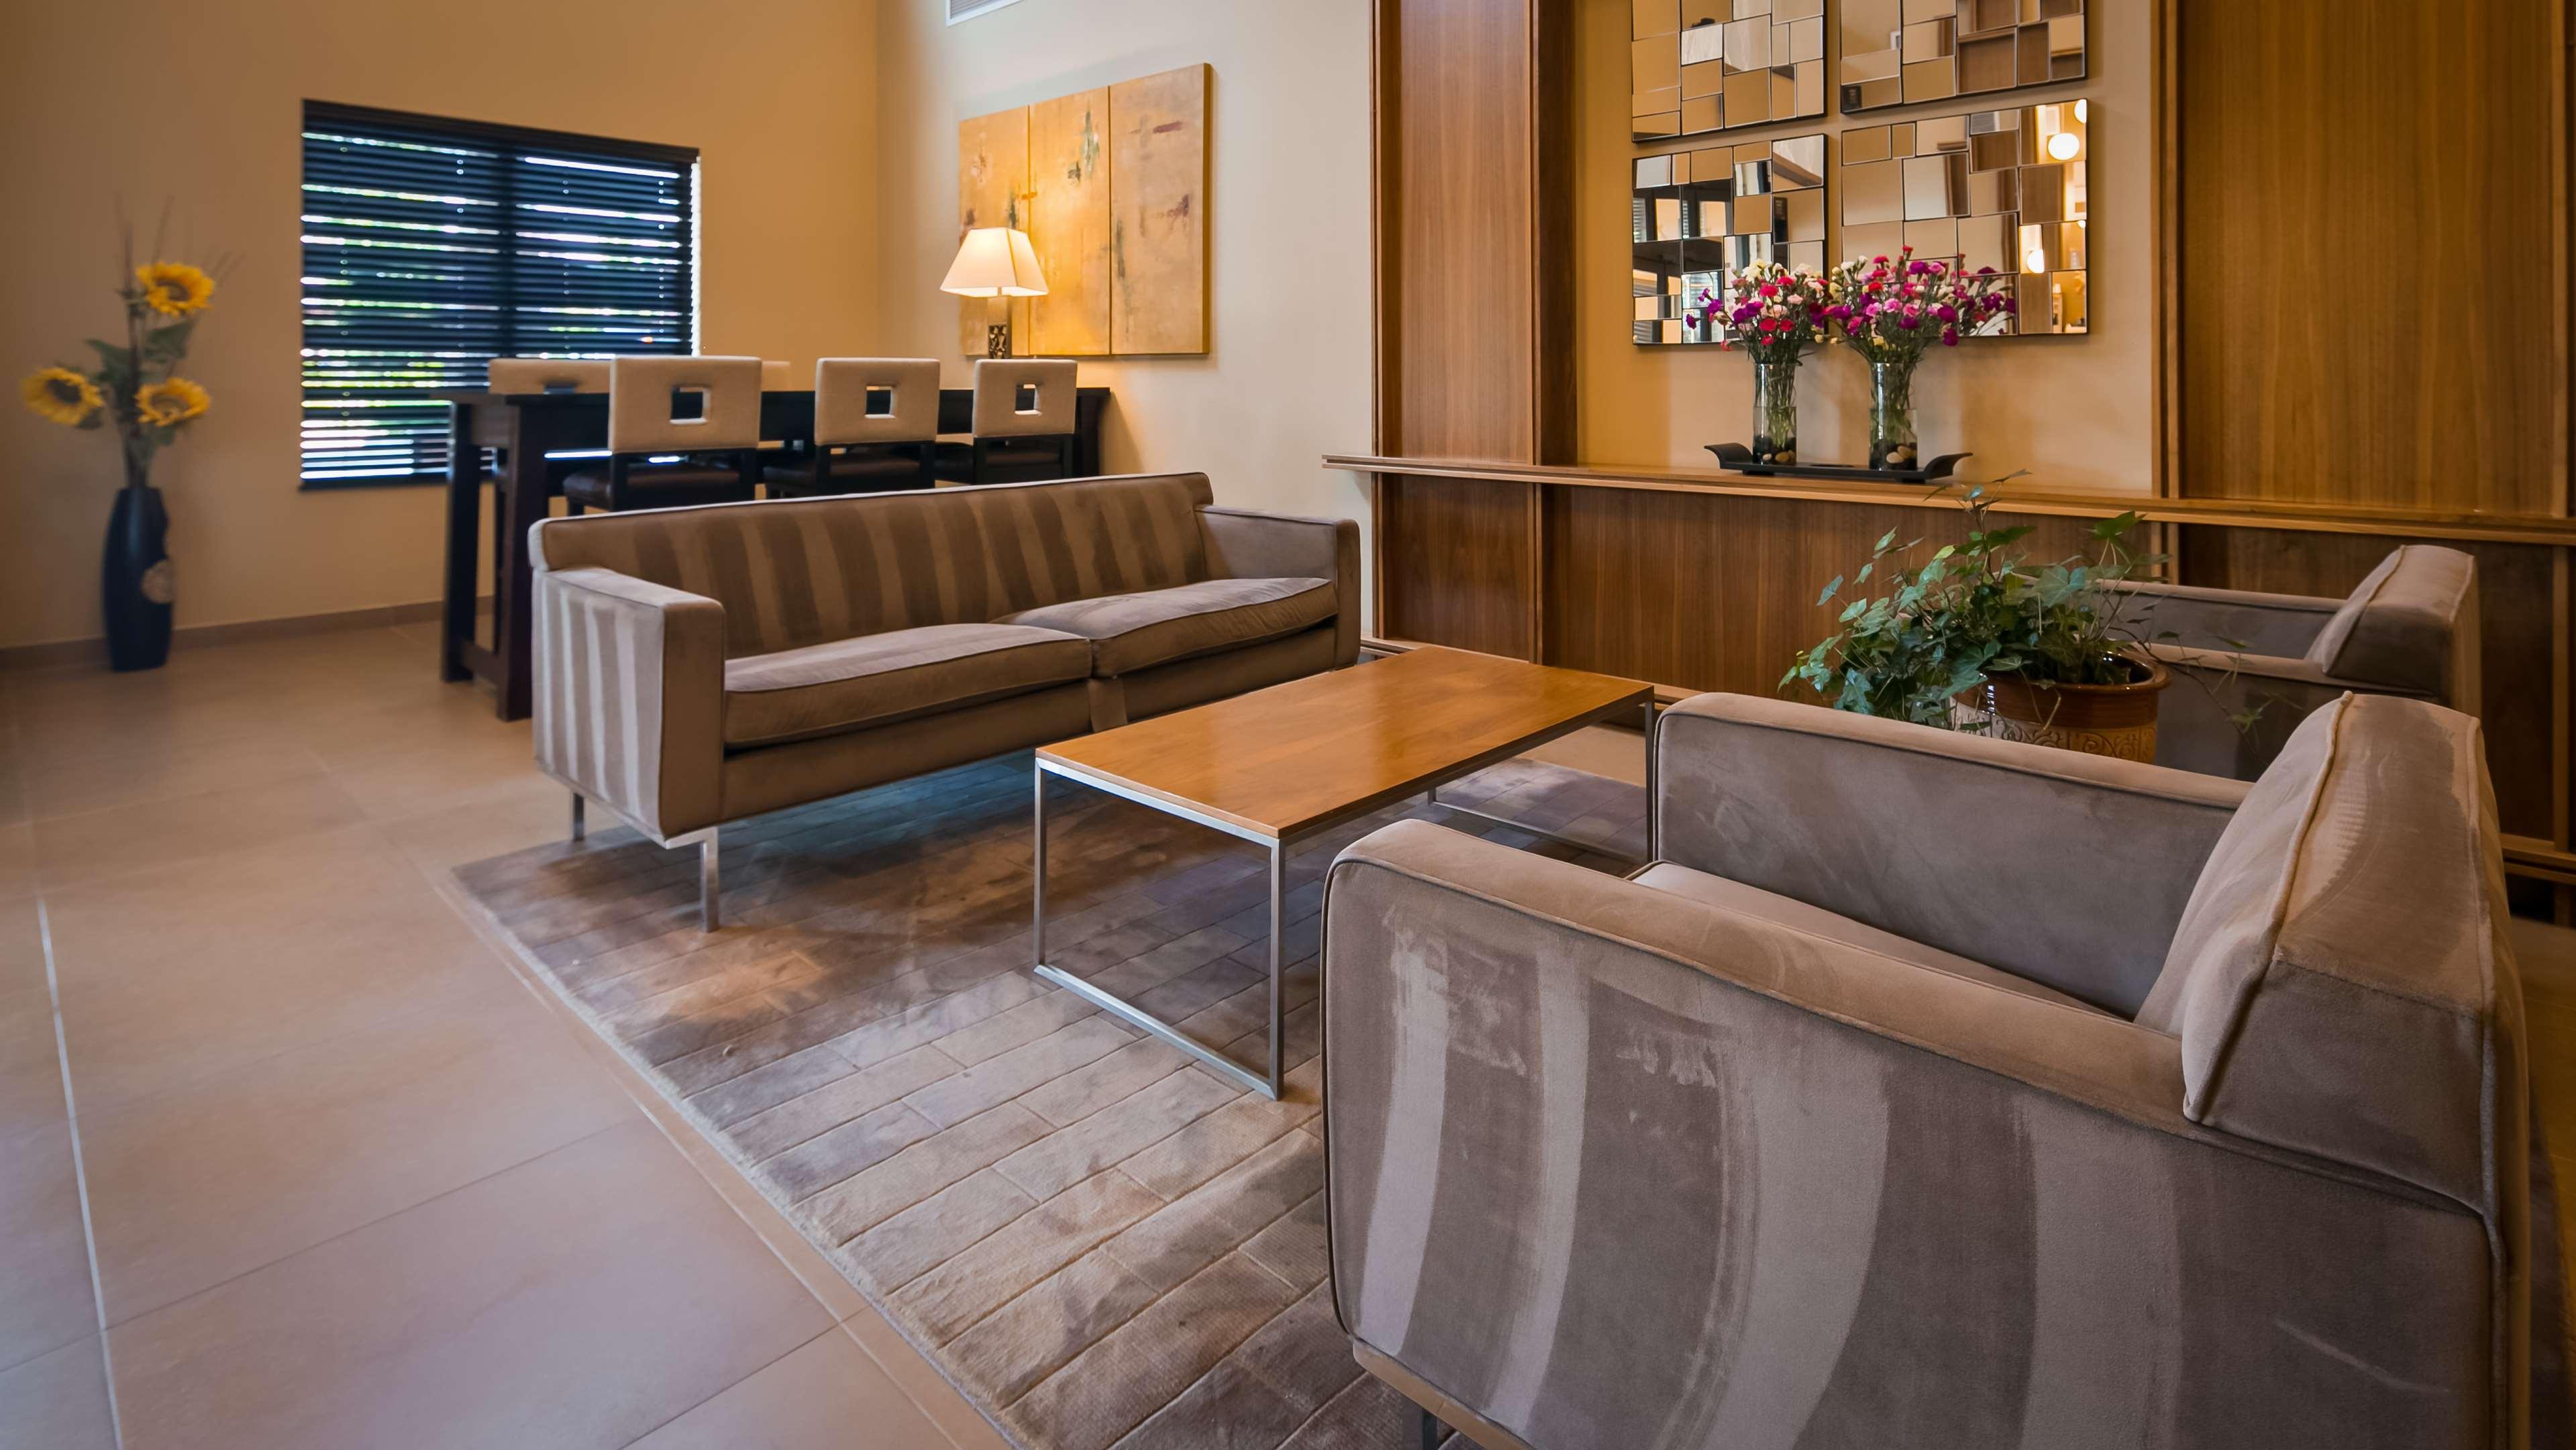 Best Western Plus Lacey Inn & Suites image 1